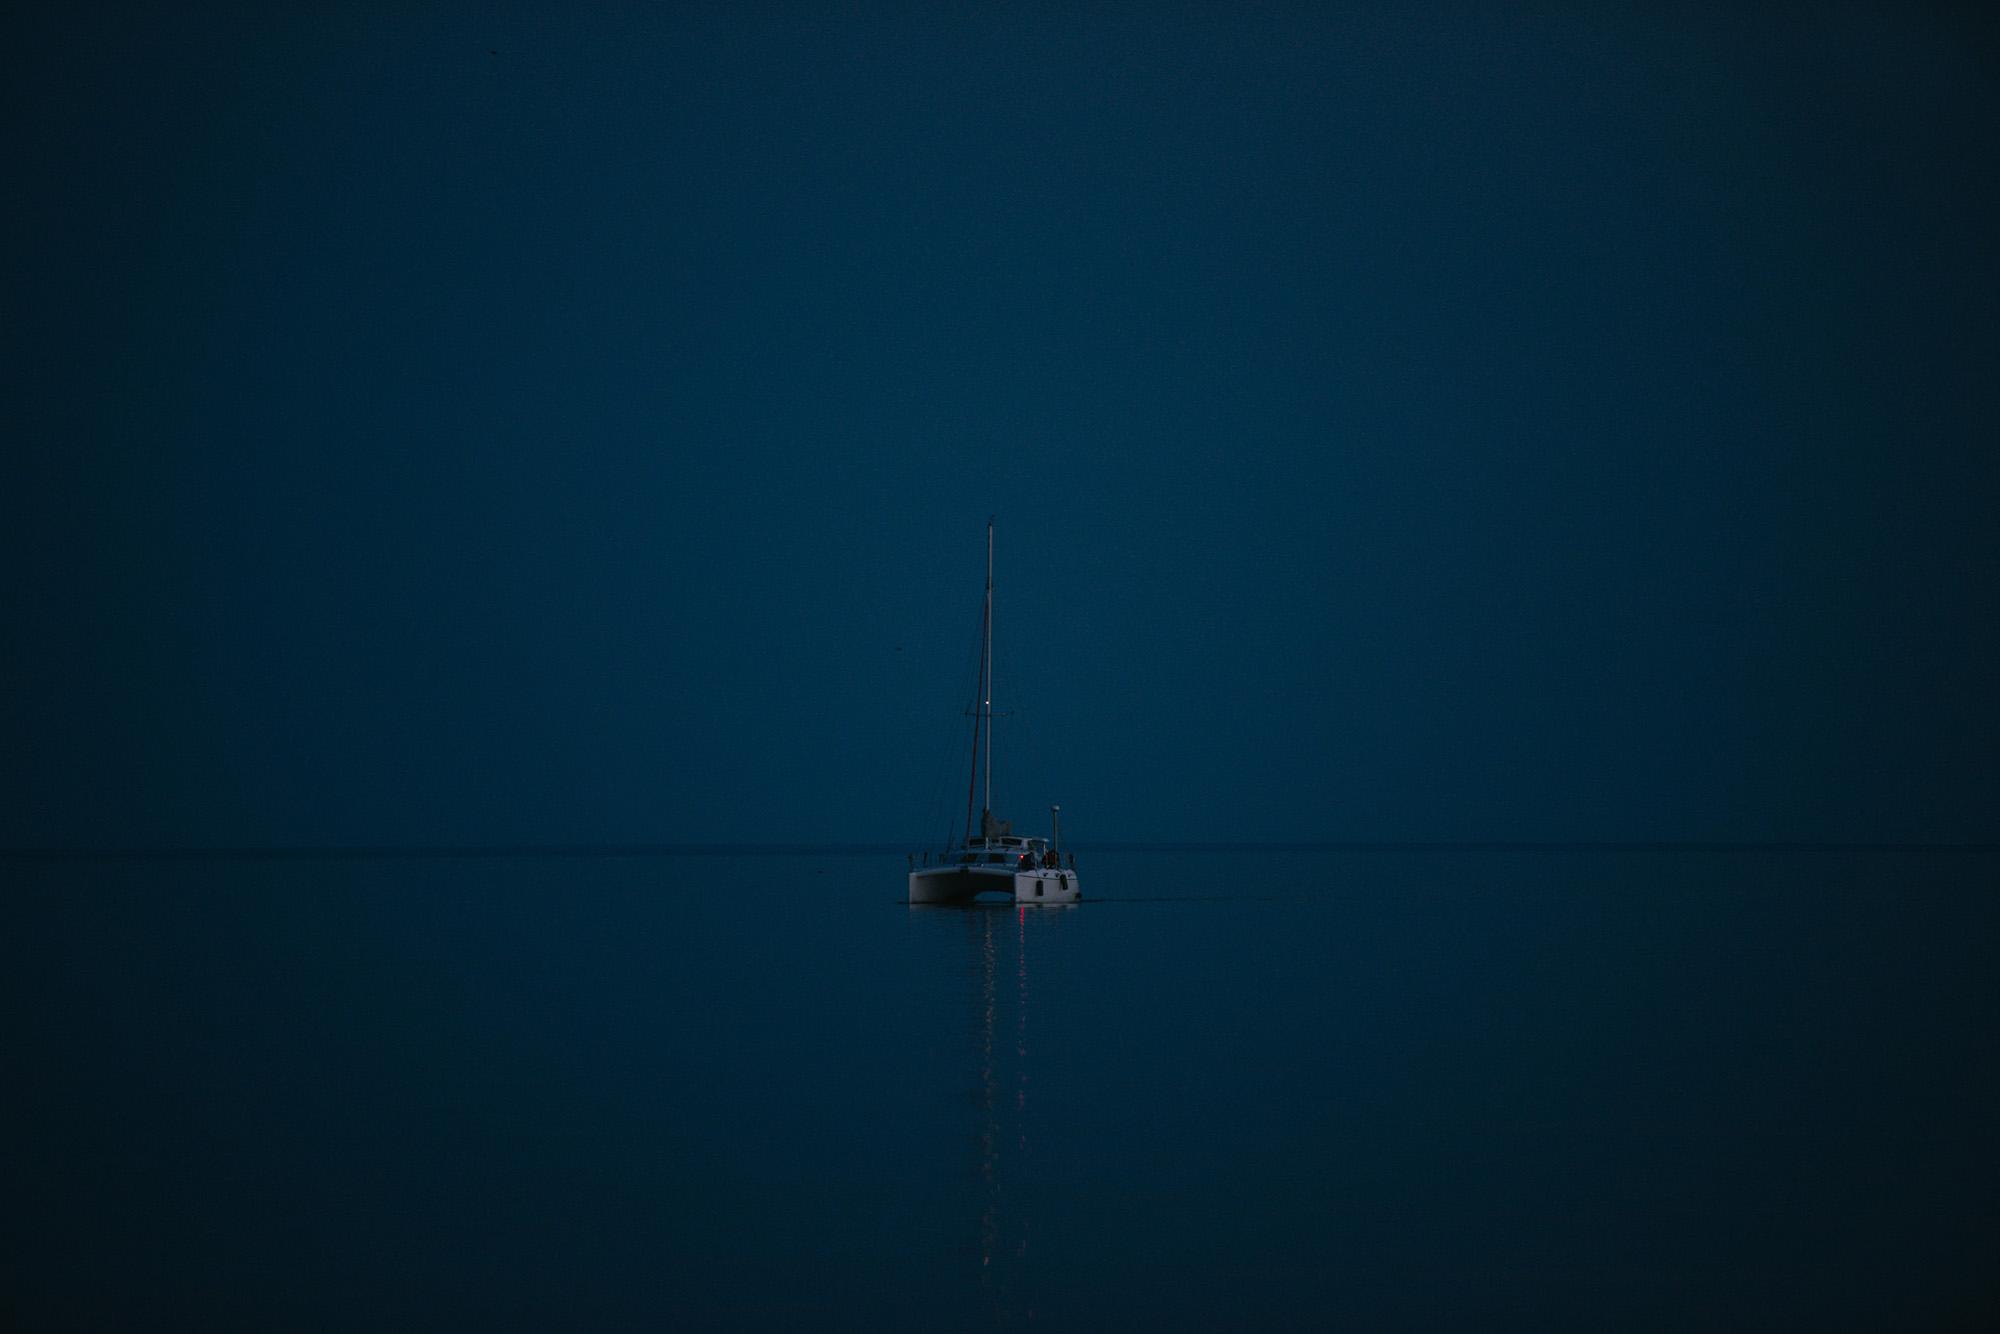 Sail-2291.jpg